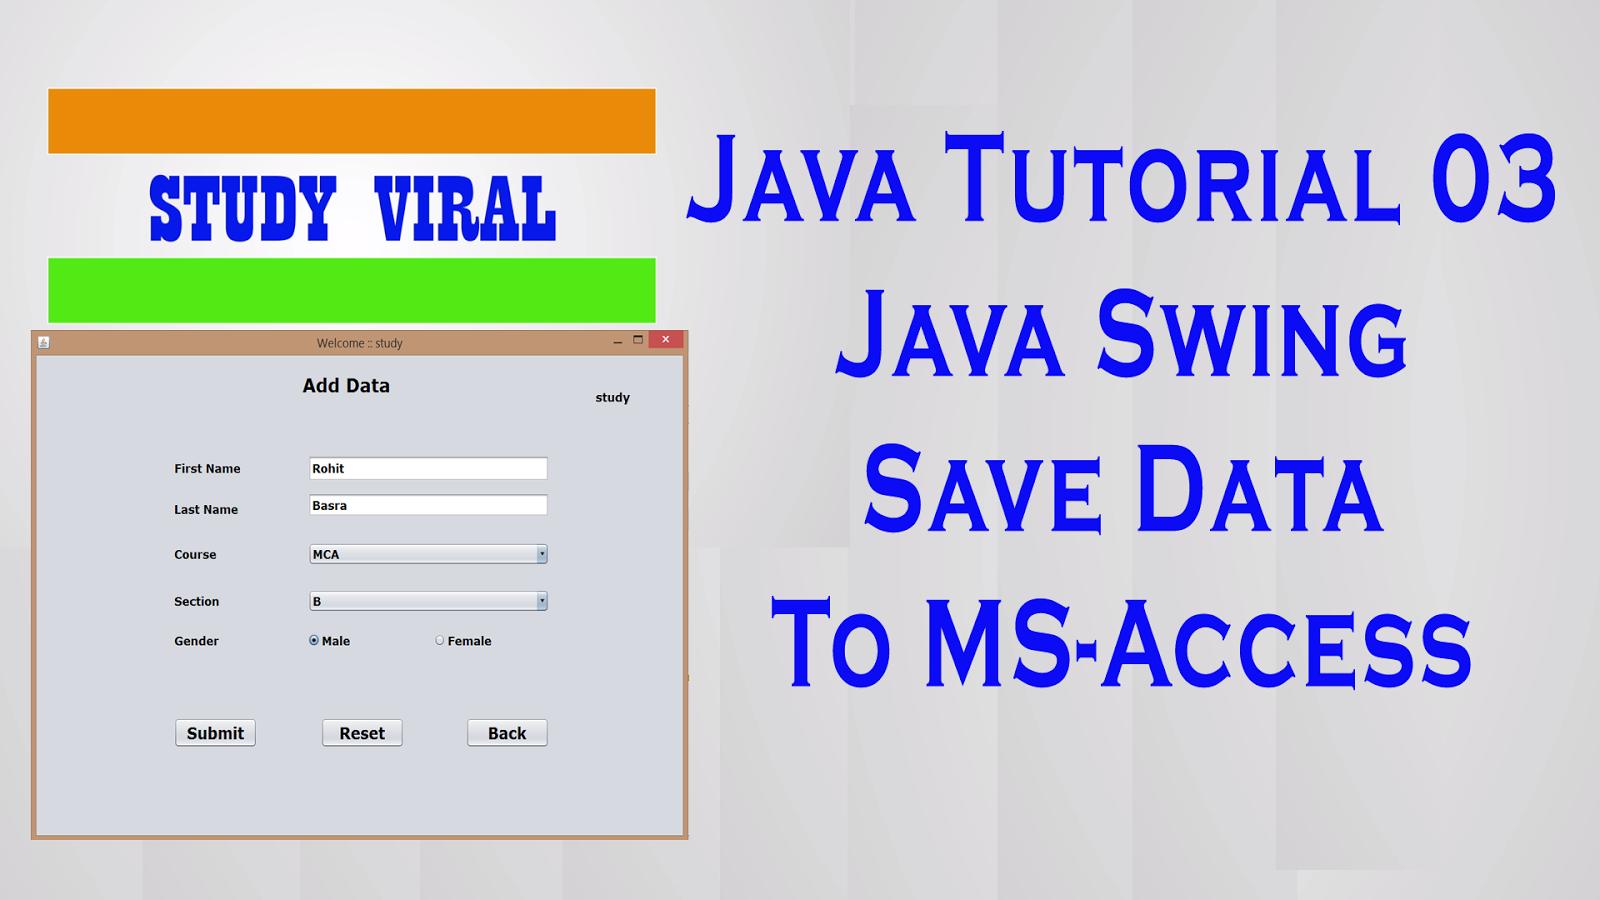 Java Swing Save Data To MS Access using Ucanaccess - 03